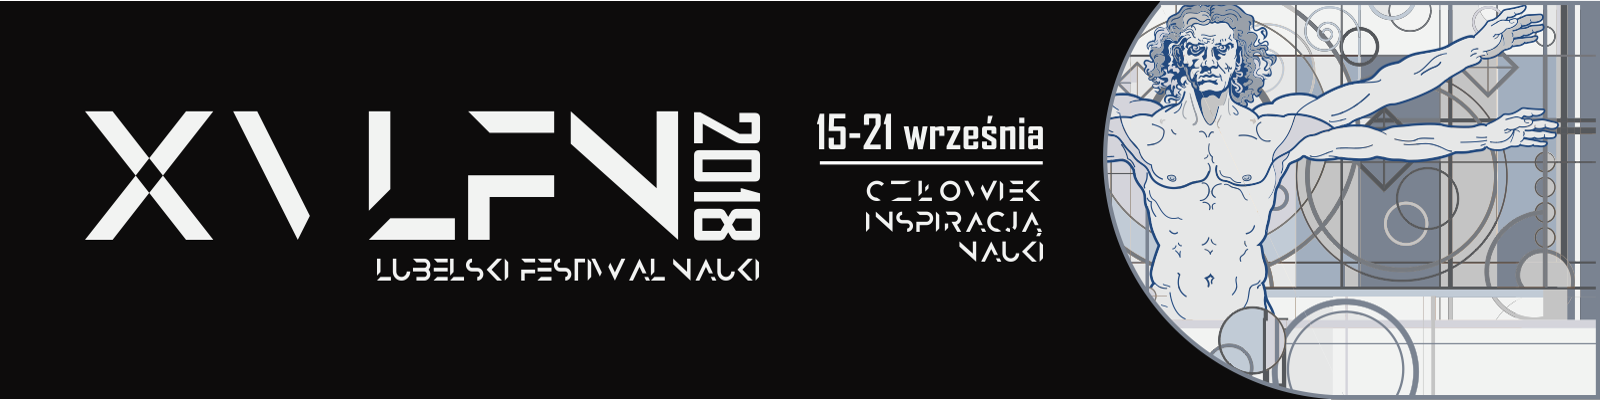 Lubelski Festiwal Nauki 2018